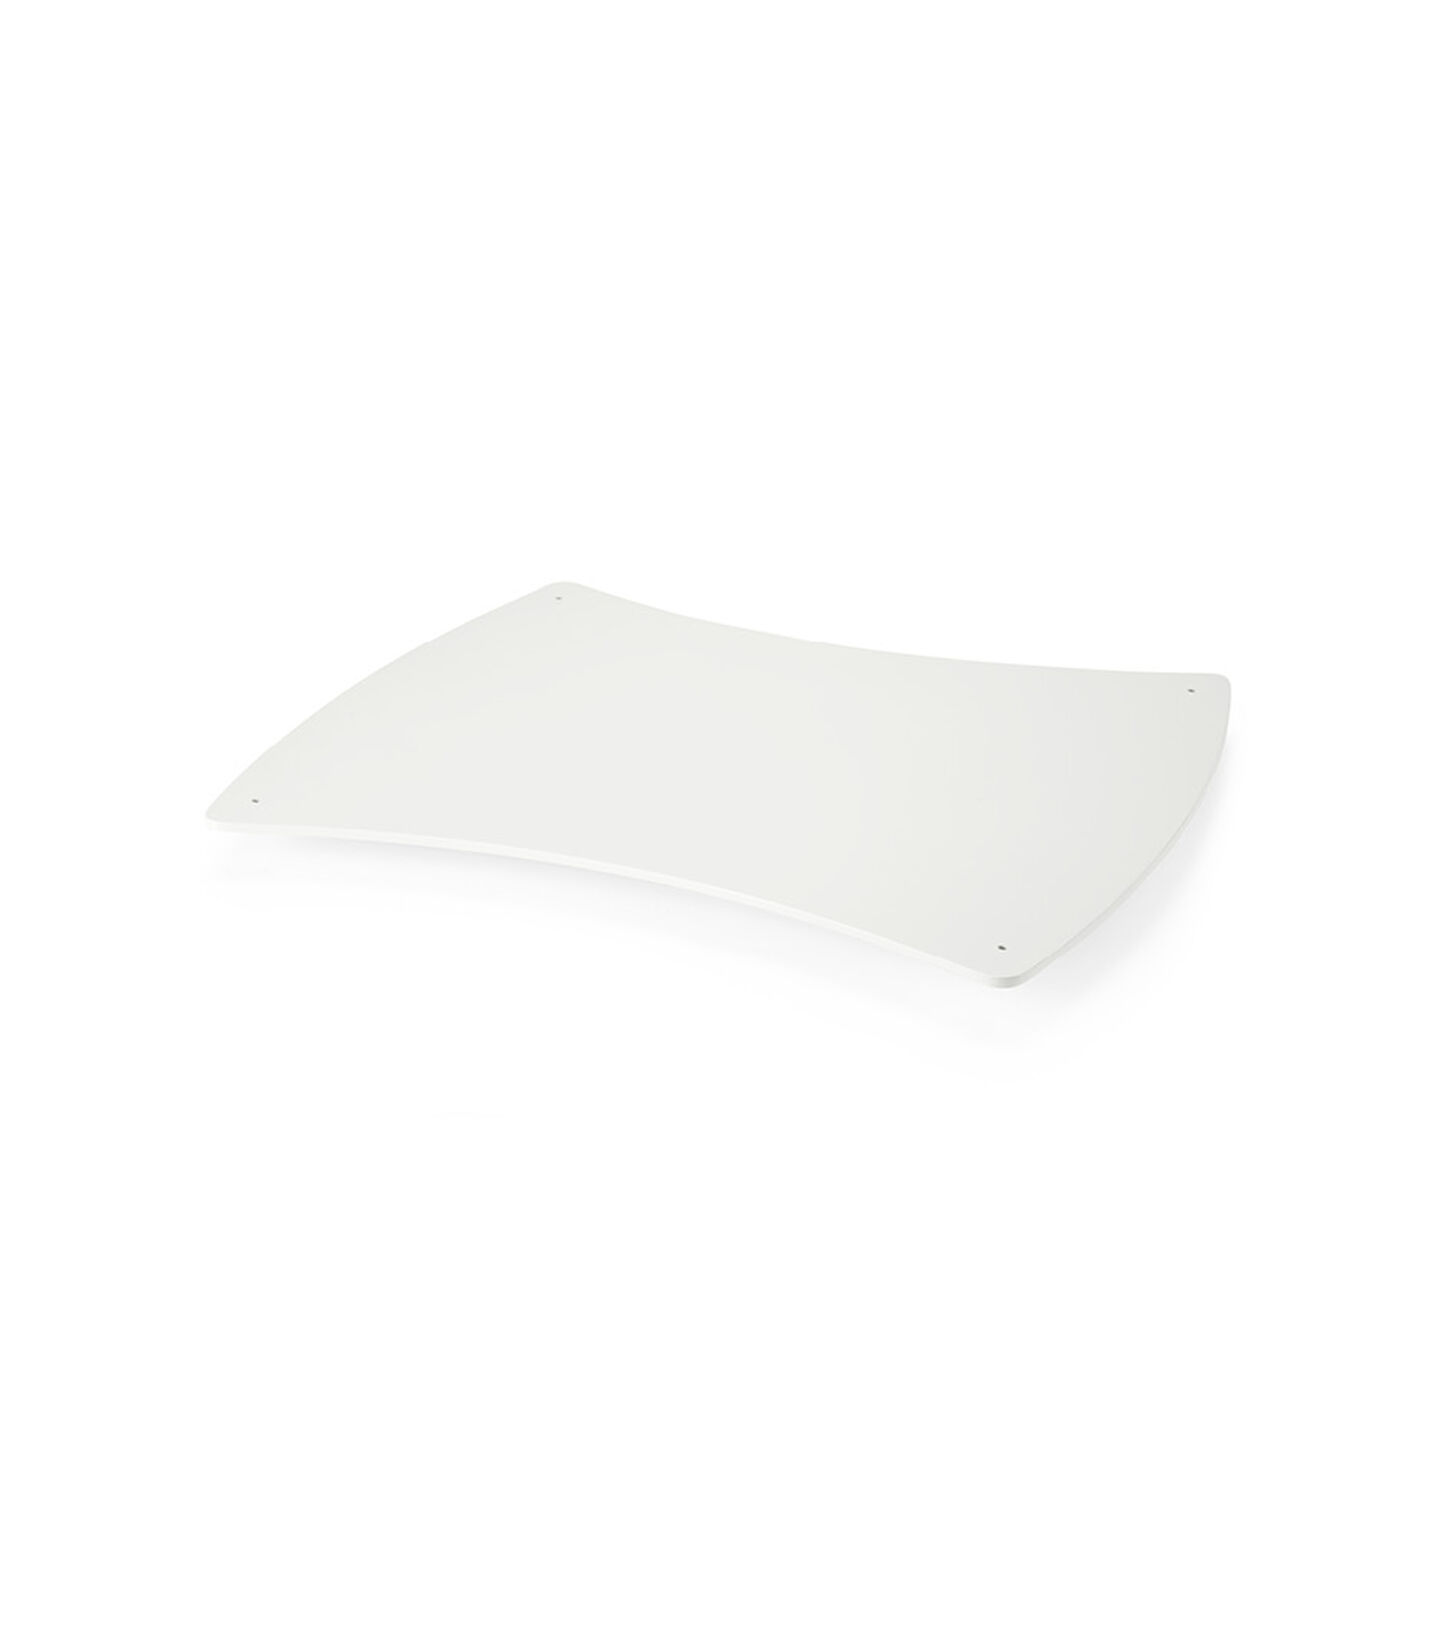 Stokke® Care™ Shelf Lower Blanco, Blanco, mainview